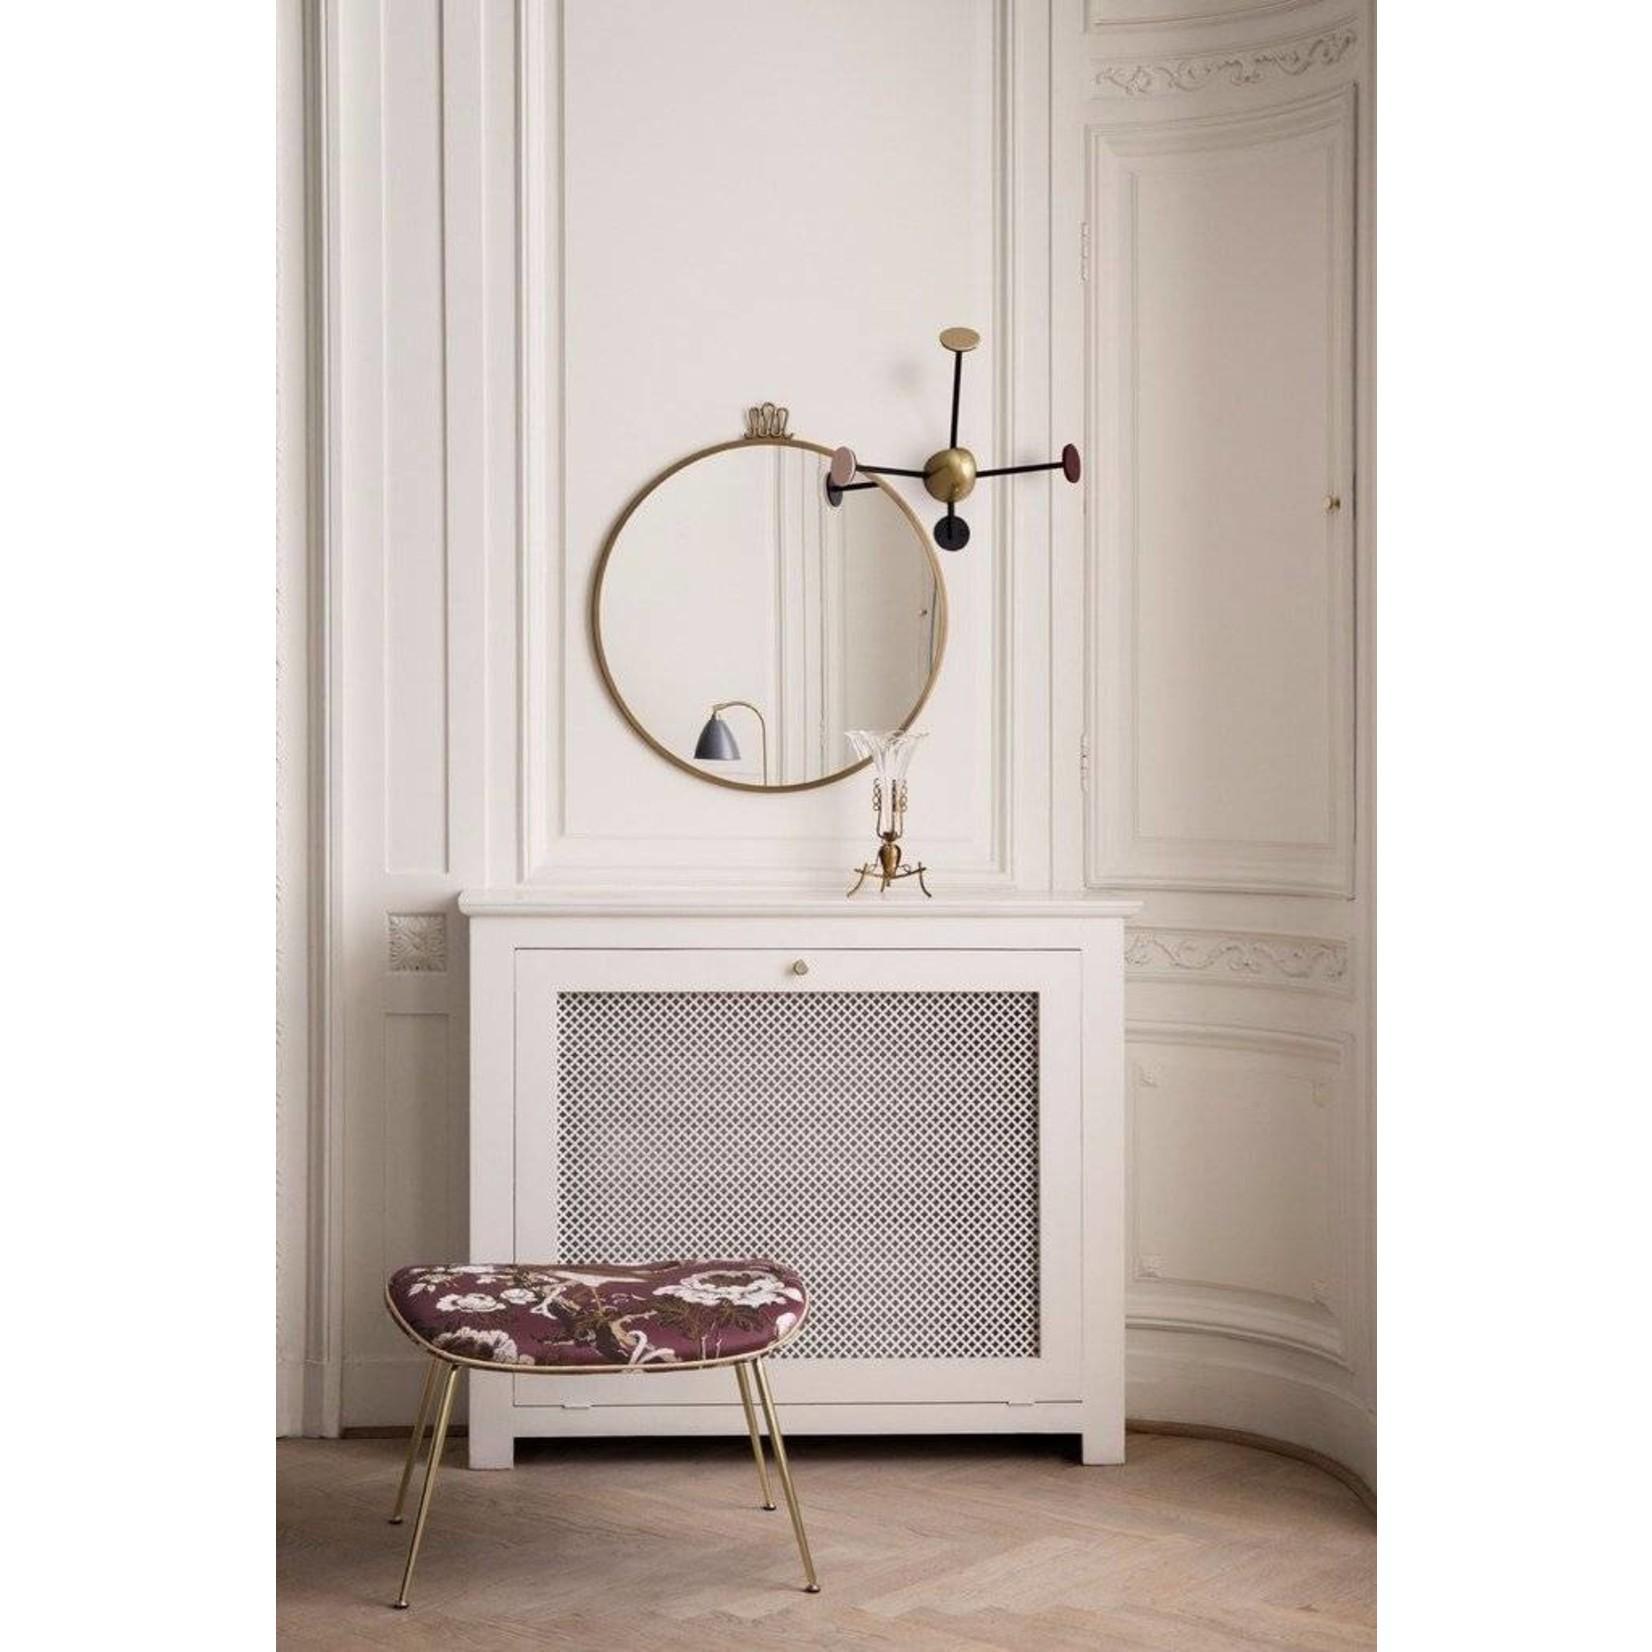 Gubi Wandspiegel Randaccio - Rond - Ø60 - Antique Brass